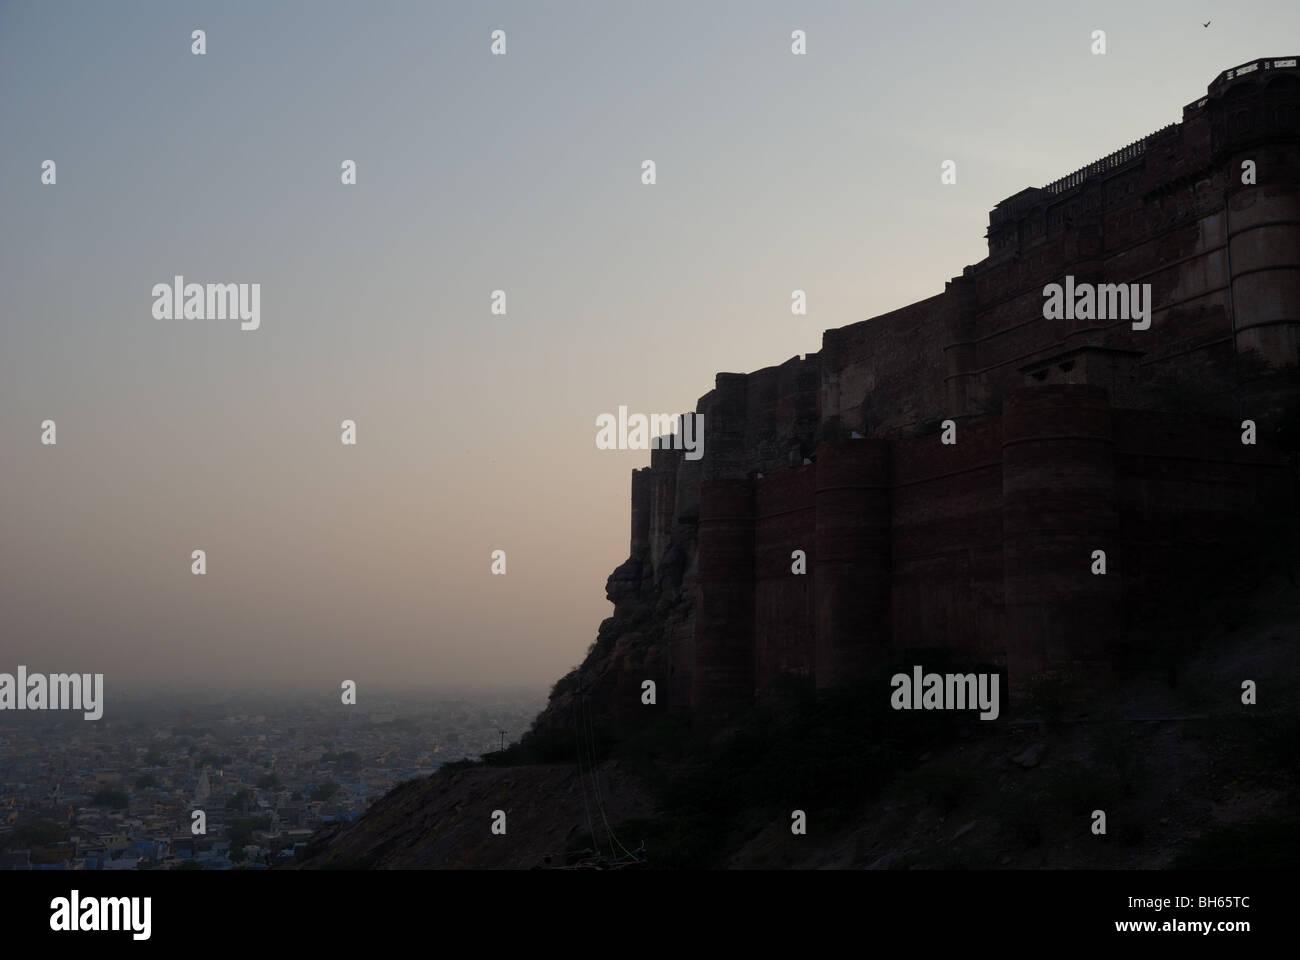 Silhouette of Mehrangarh Fort  with Jodhpur bellow. India. Stock Photo